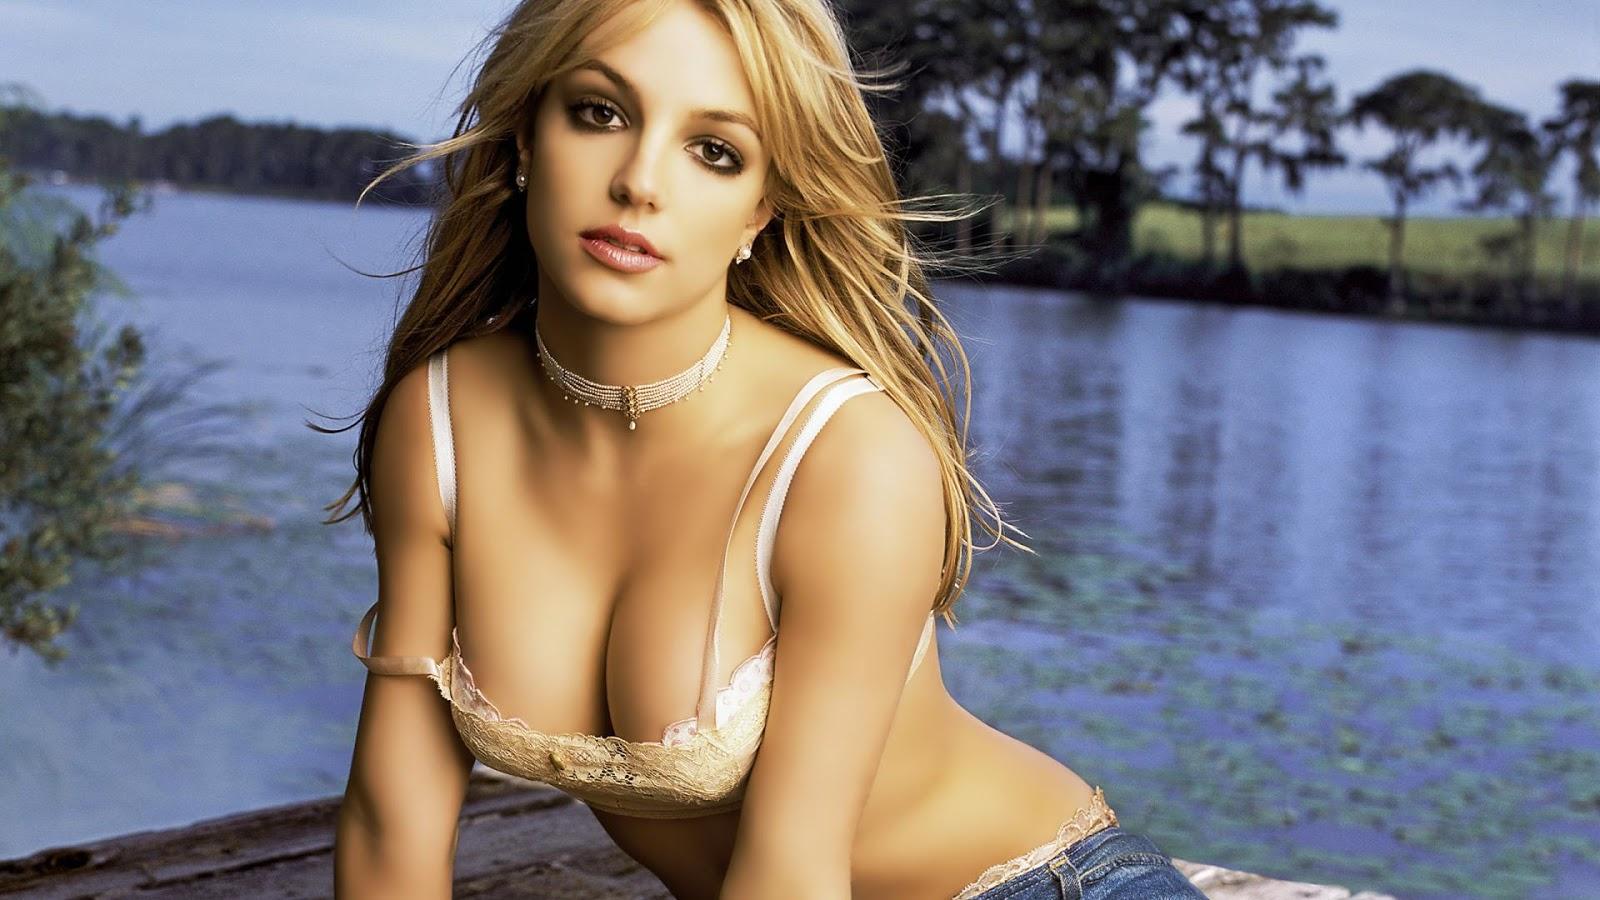 http://3.bp.blogspot.com/-LE9eX2Yikls/UUa4QzEx1NI/AAAAAAAAAf8/tUDj2quCsz0/s1600/Britney-Spears-Hot-HD-Wallpaper.jpg